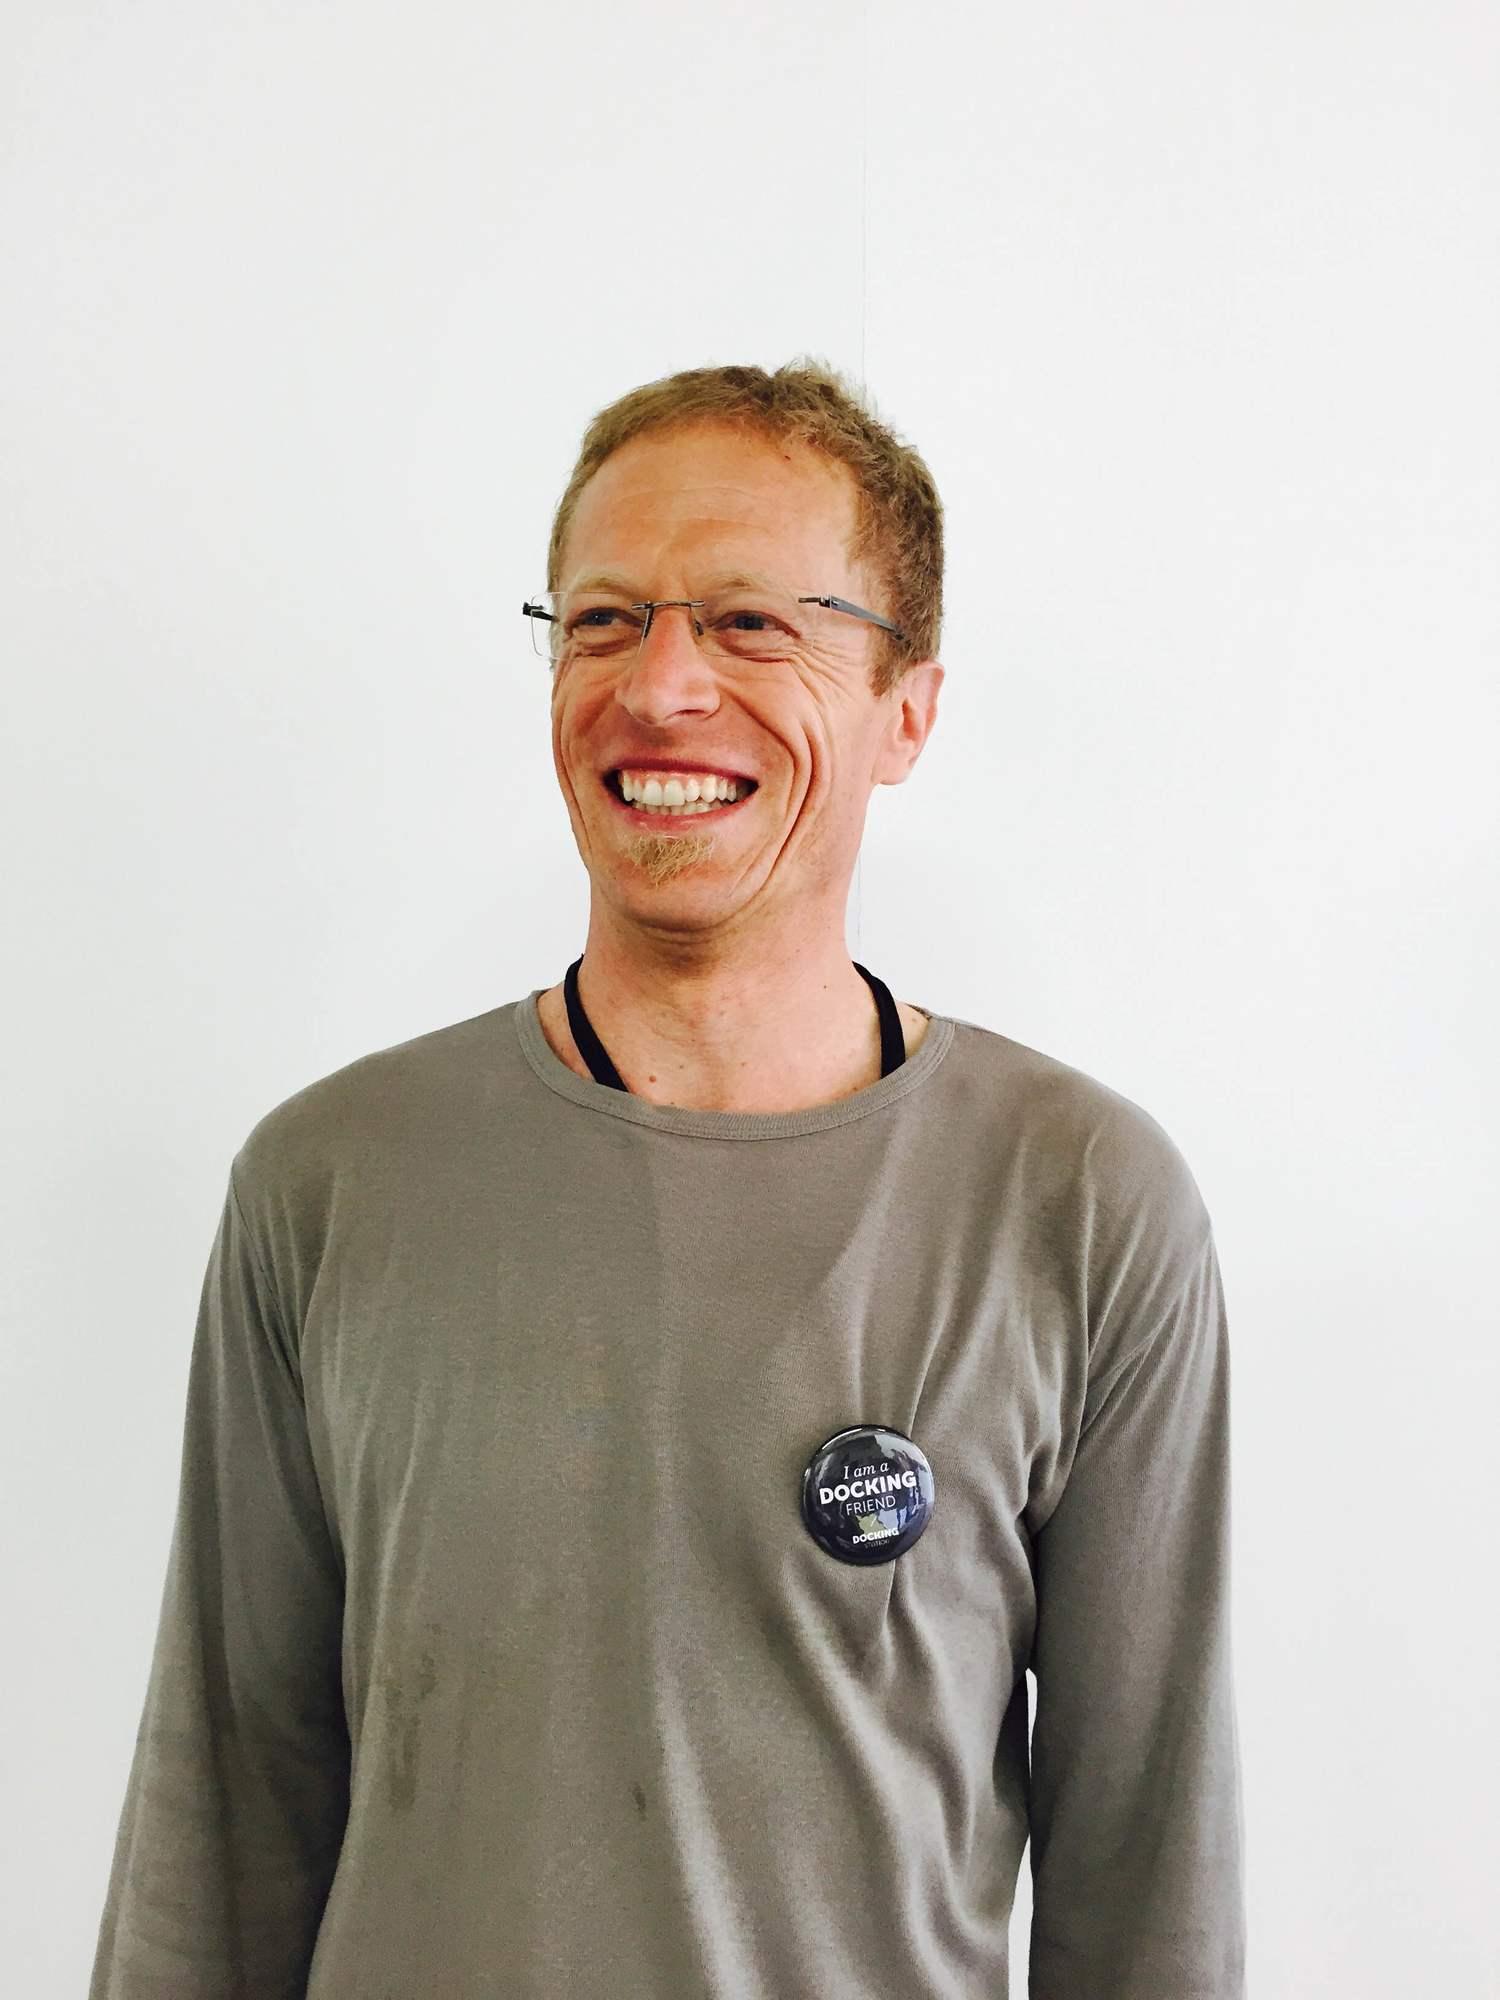 Greg Zibell